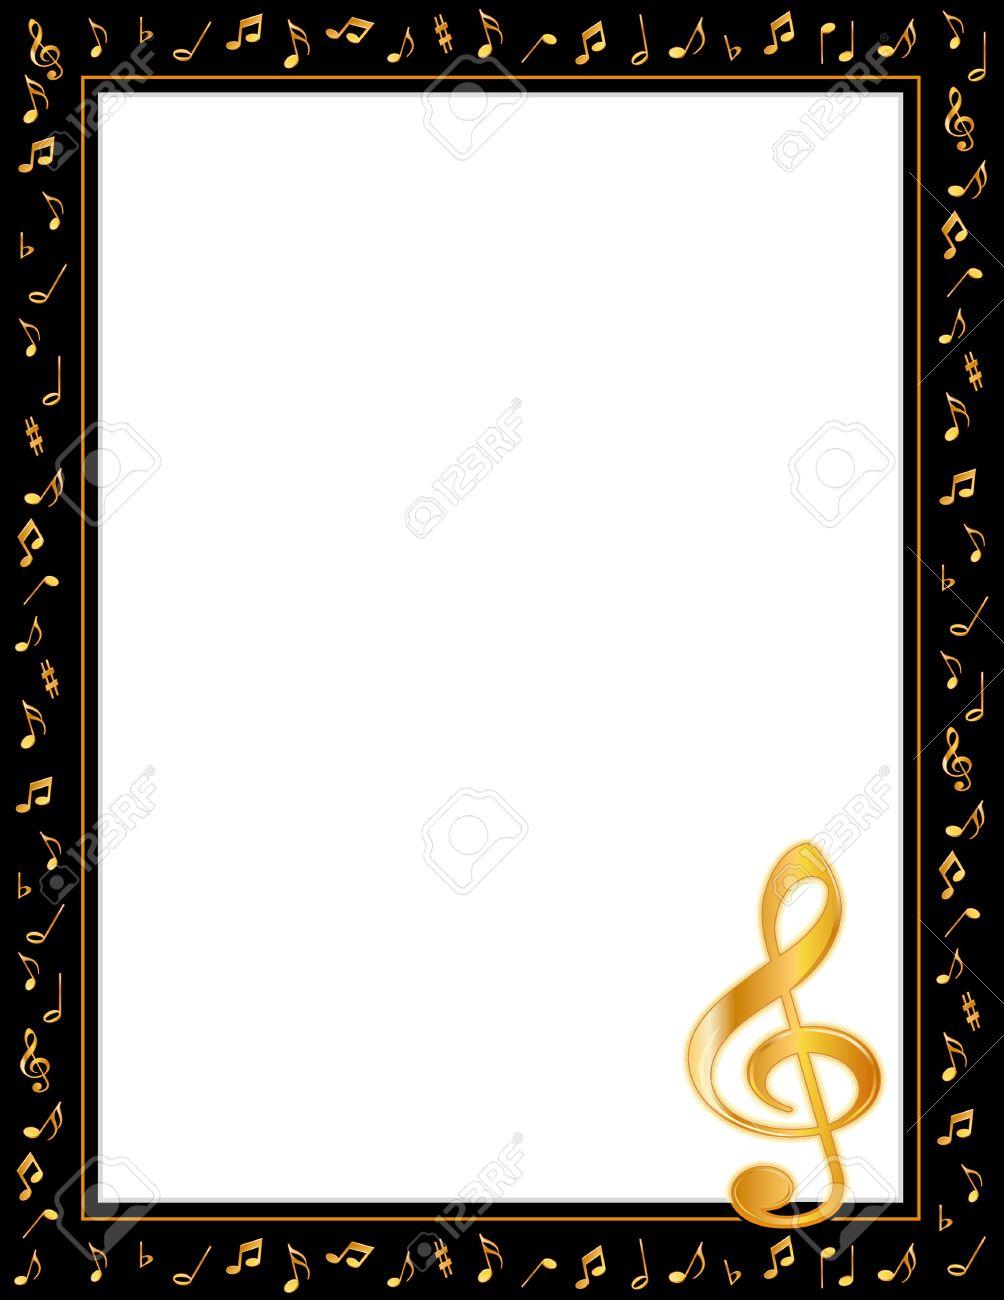 Music Entertainment Poster Frame, Black Border, Gold Music Notes ...